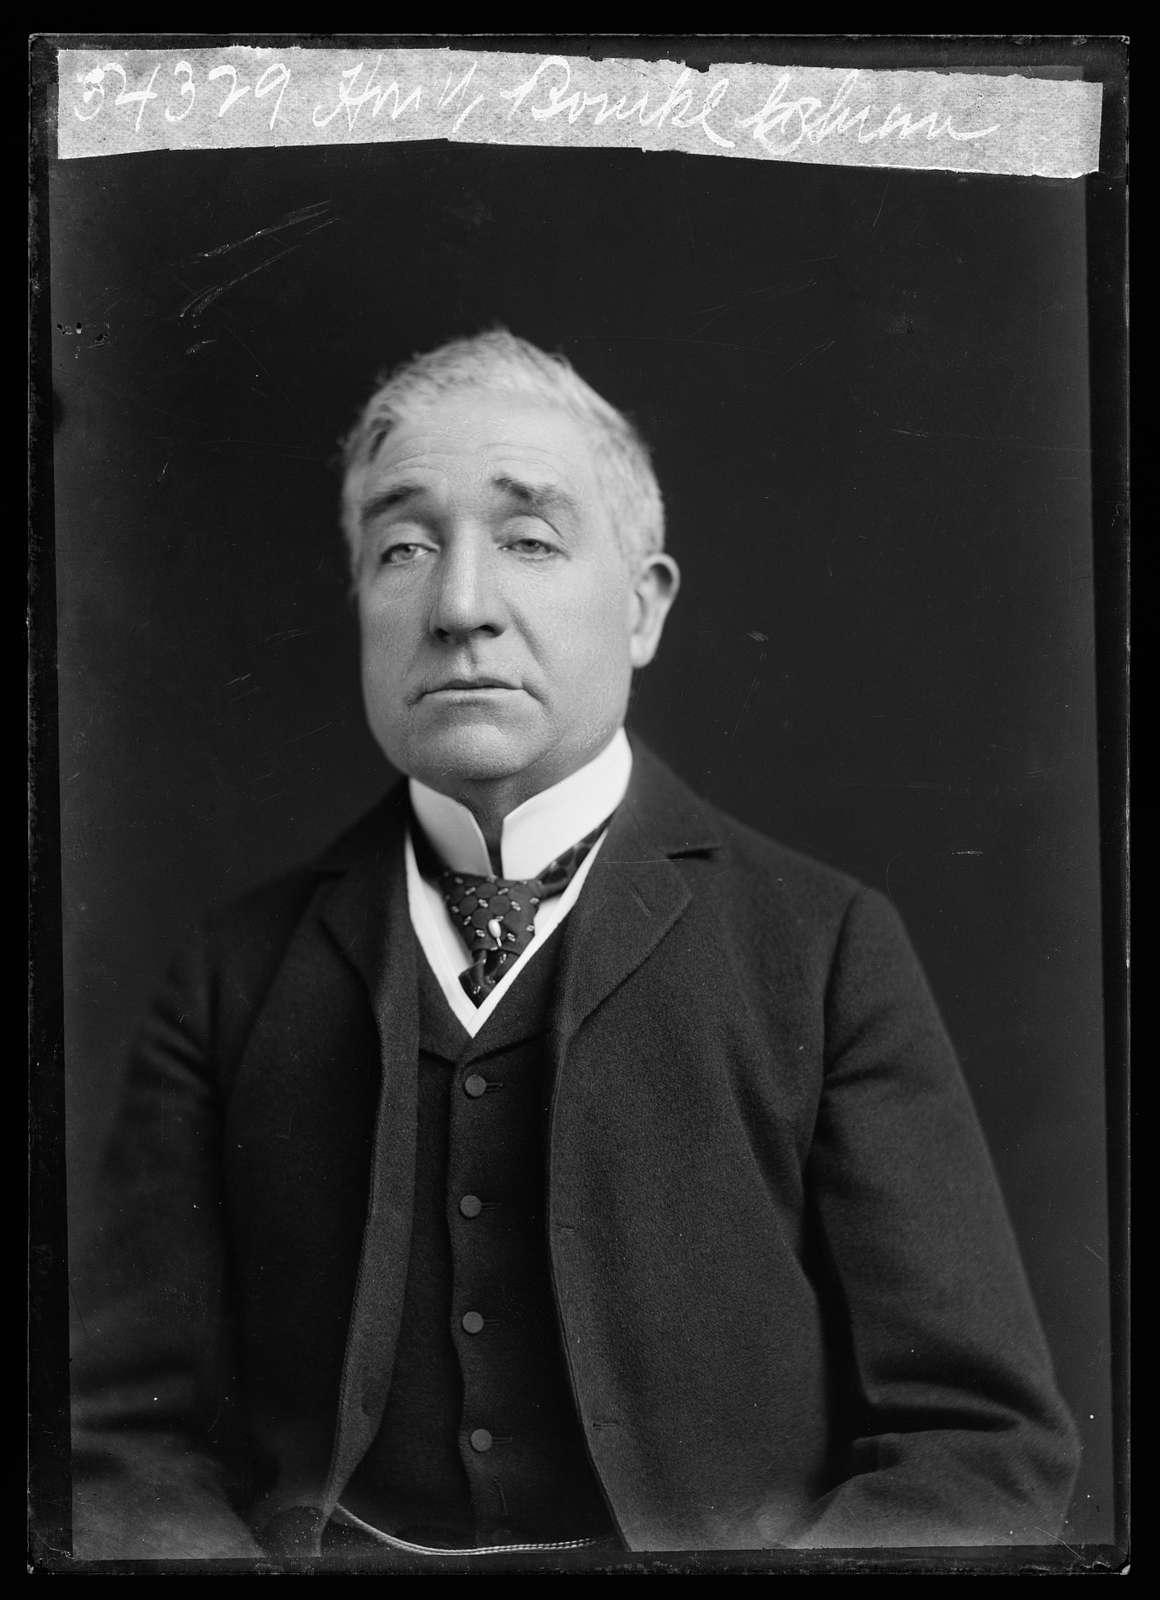 Cochran, Hon. W. Bourke